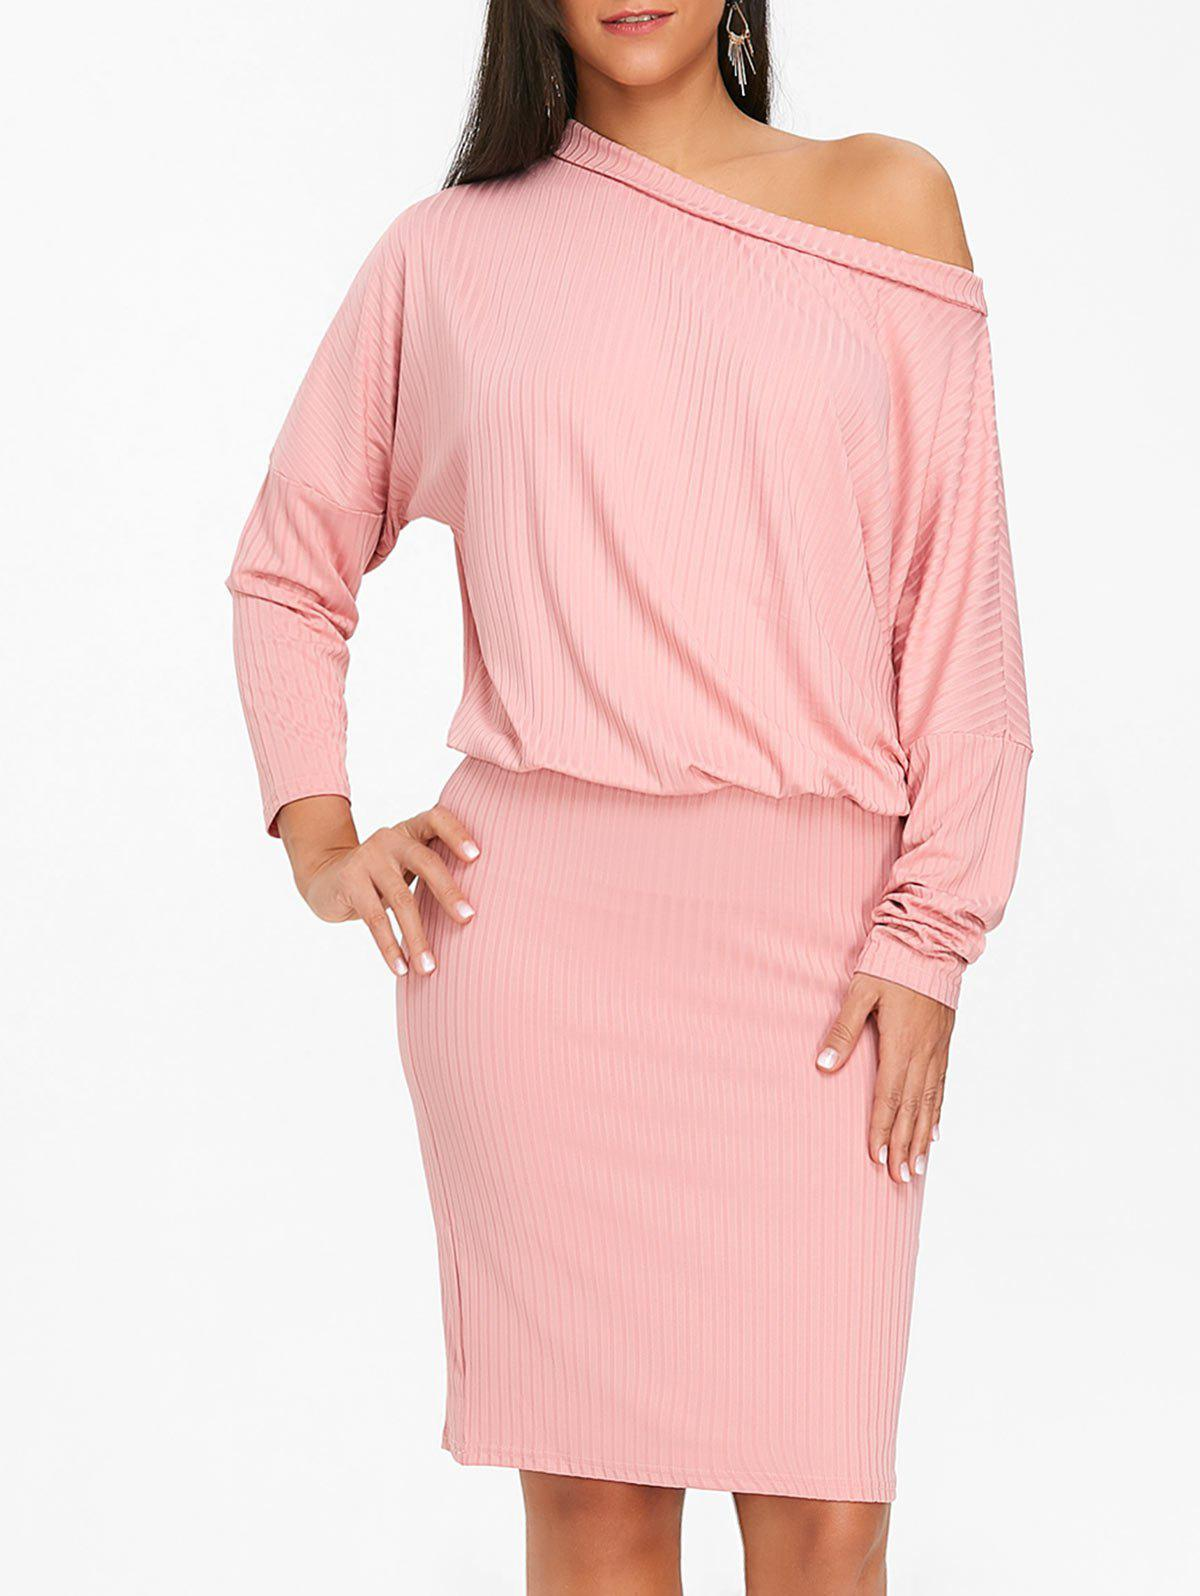 Skew Neck Batwing Sleeve Ribbed Dress 236836601